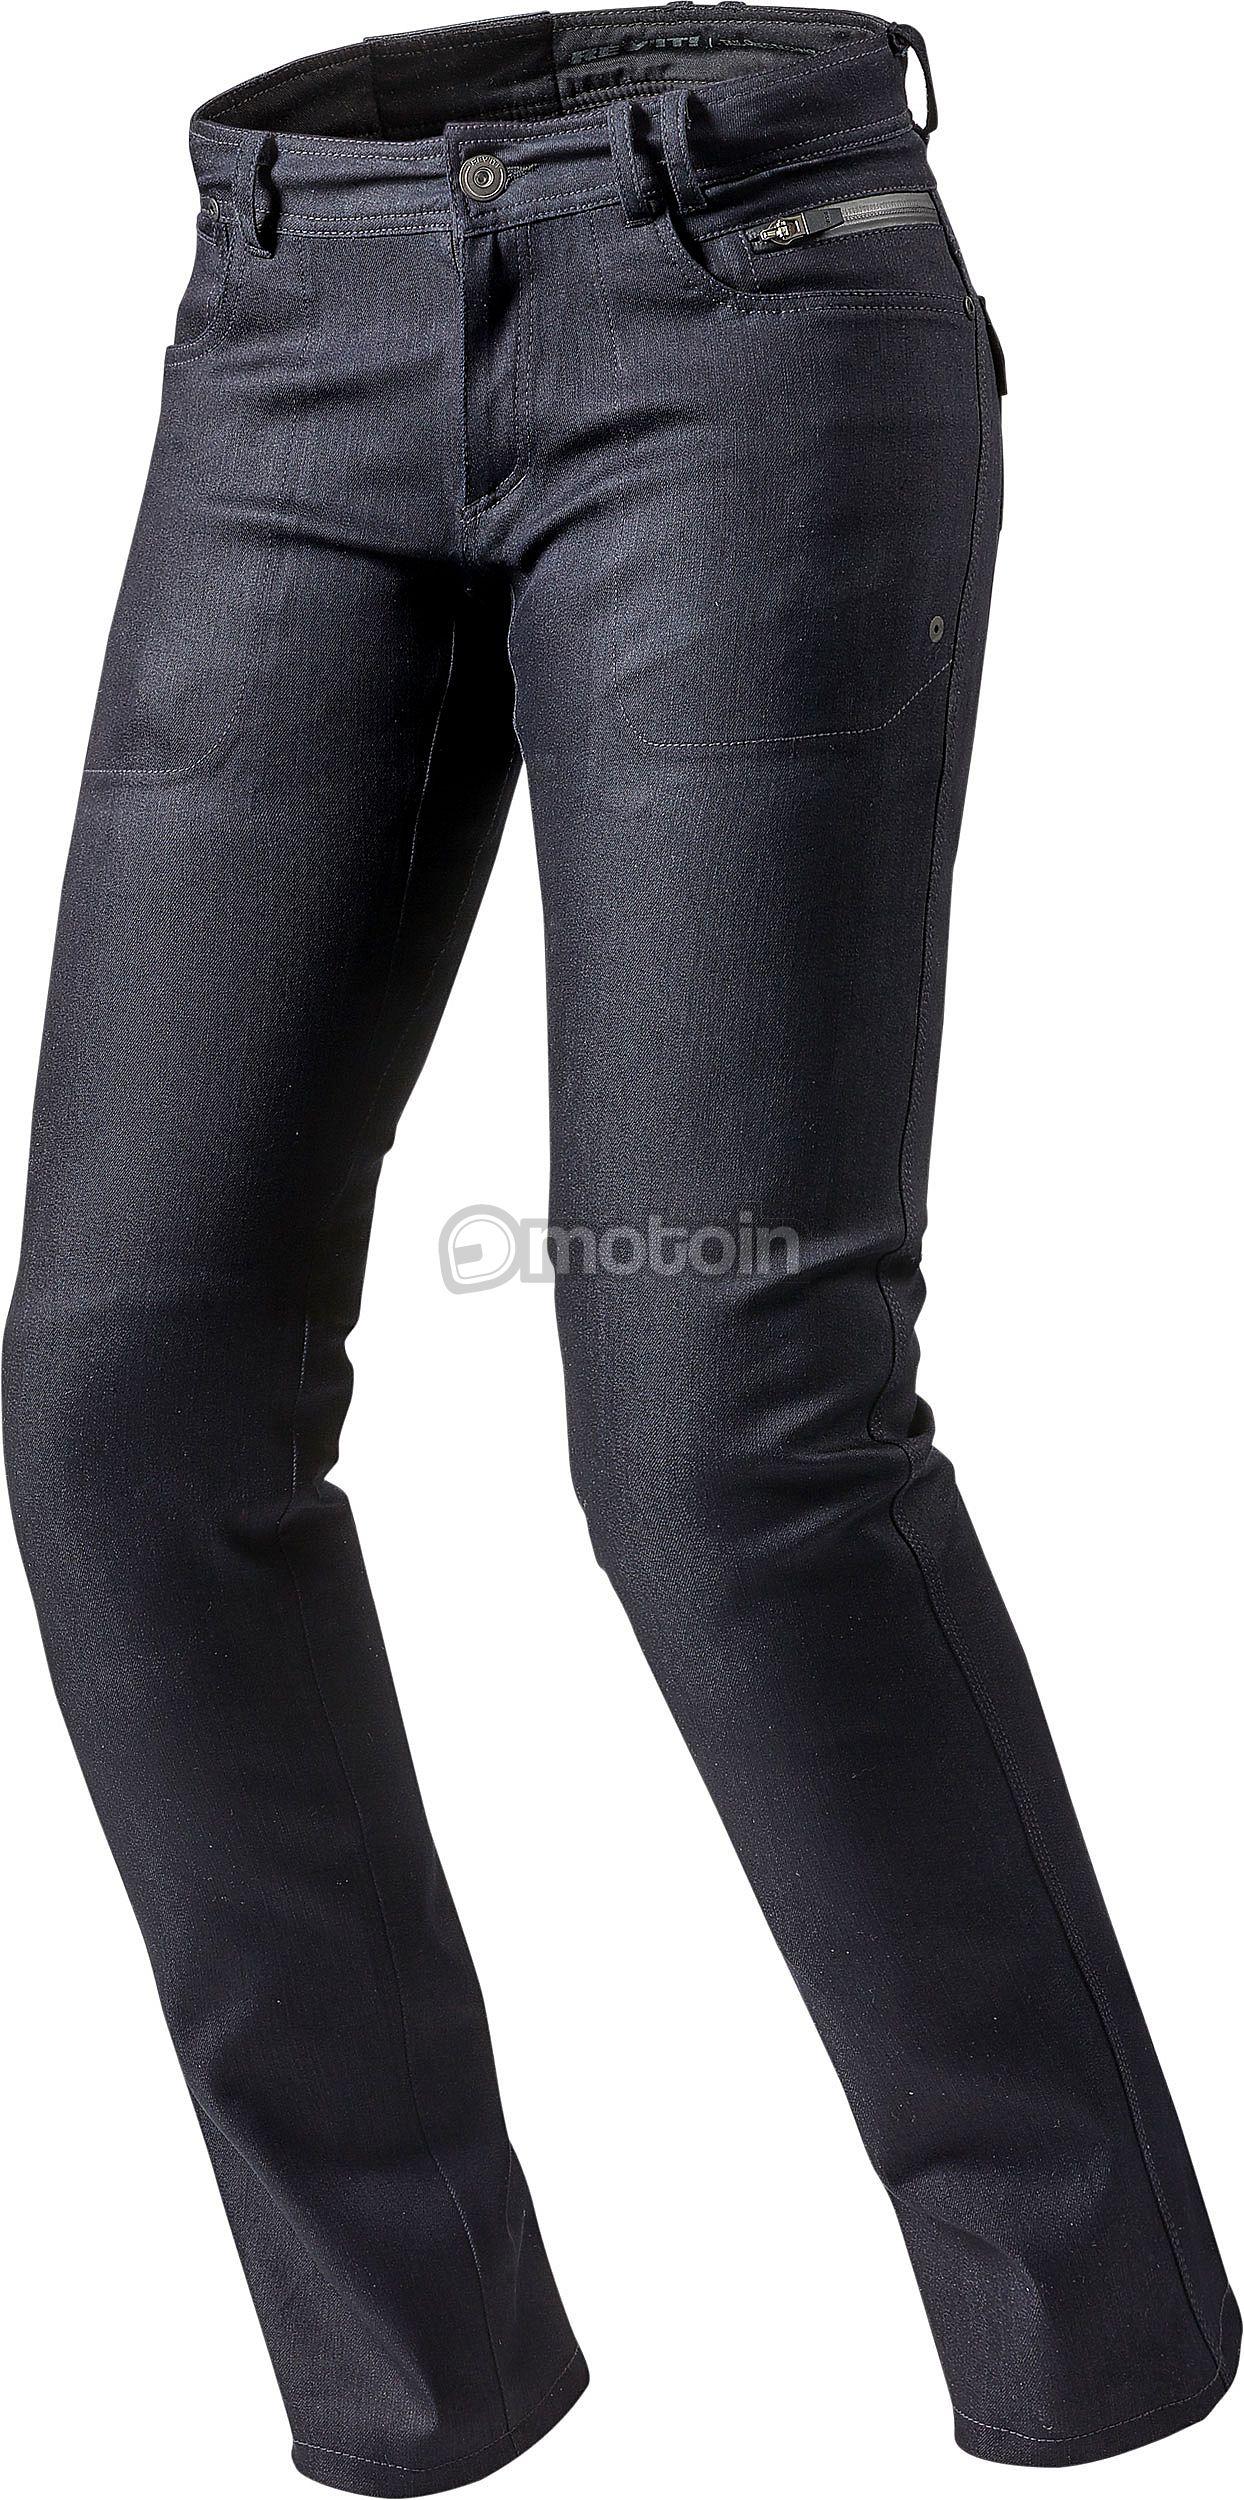 revit orlando h2o jeans wasserdicht damen. Black Bedroom Furniture Sets. Home Design Ideas